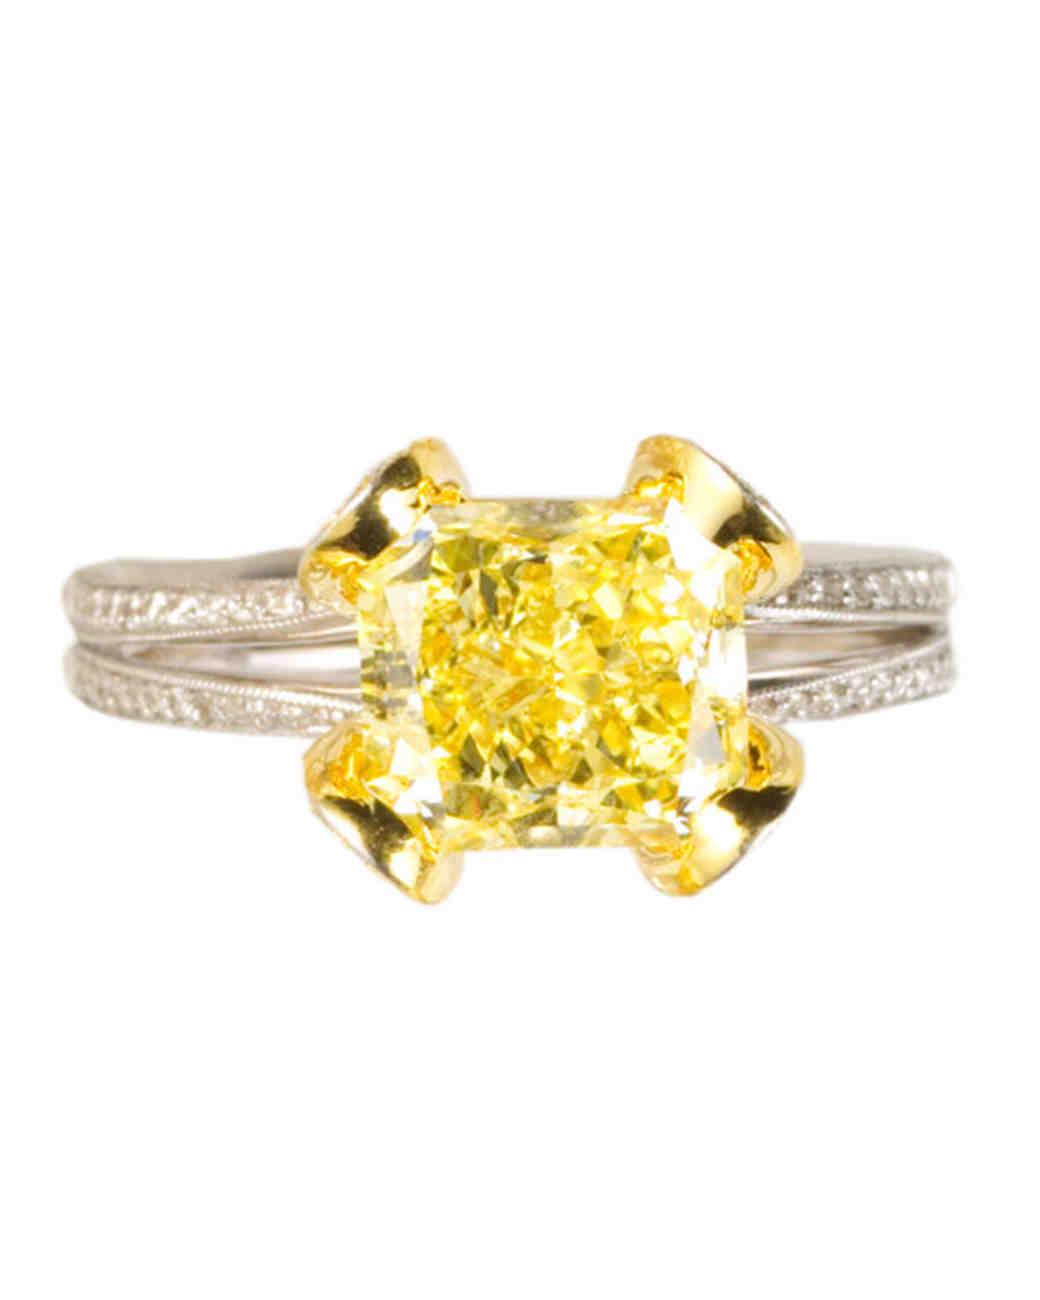 msw_sum10_yellow_ring_christse.jpg